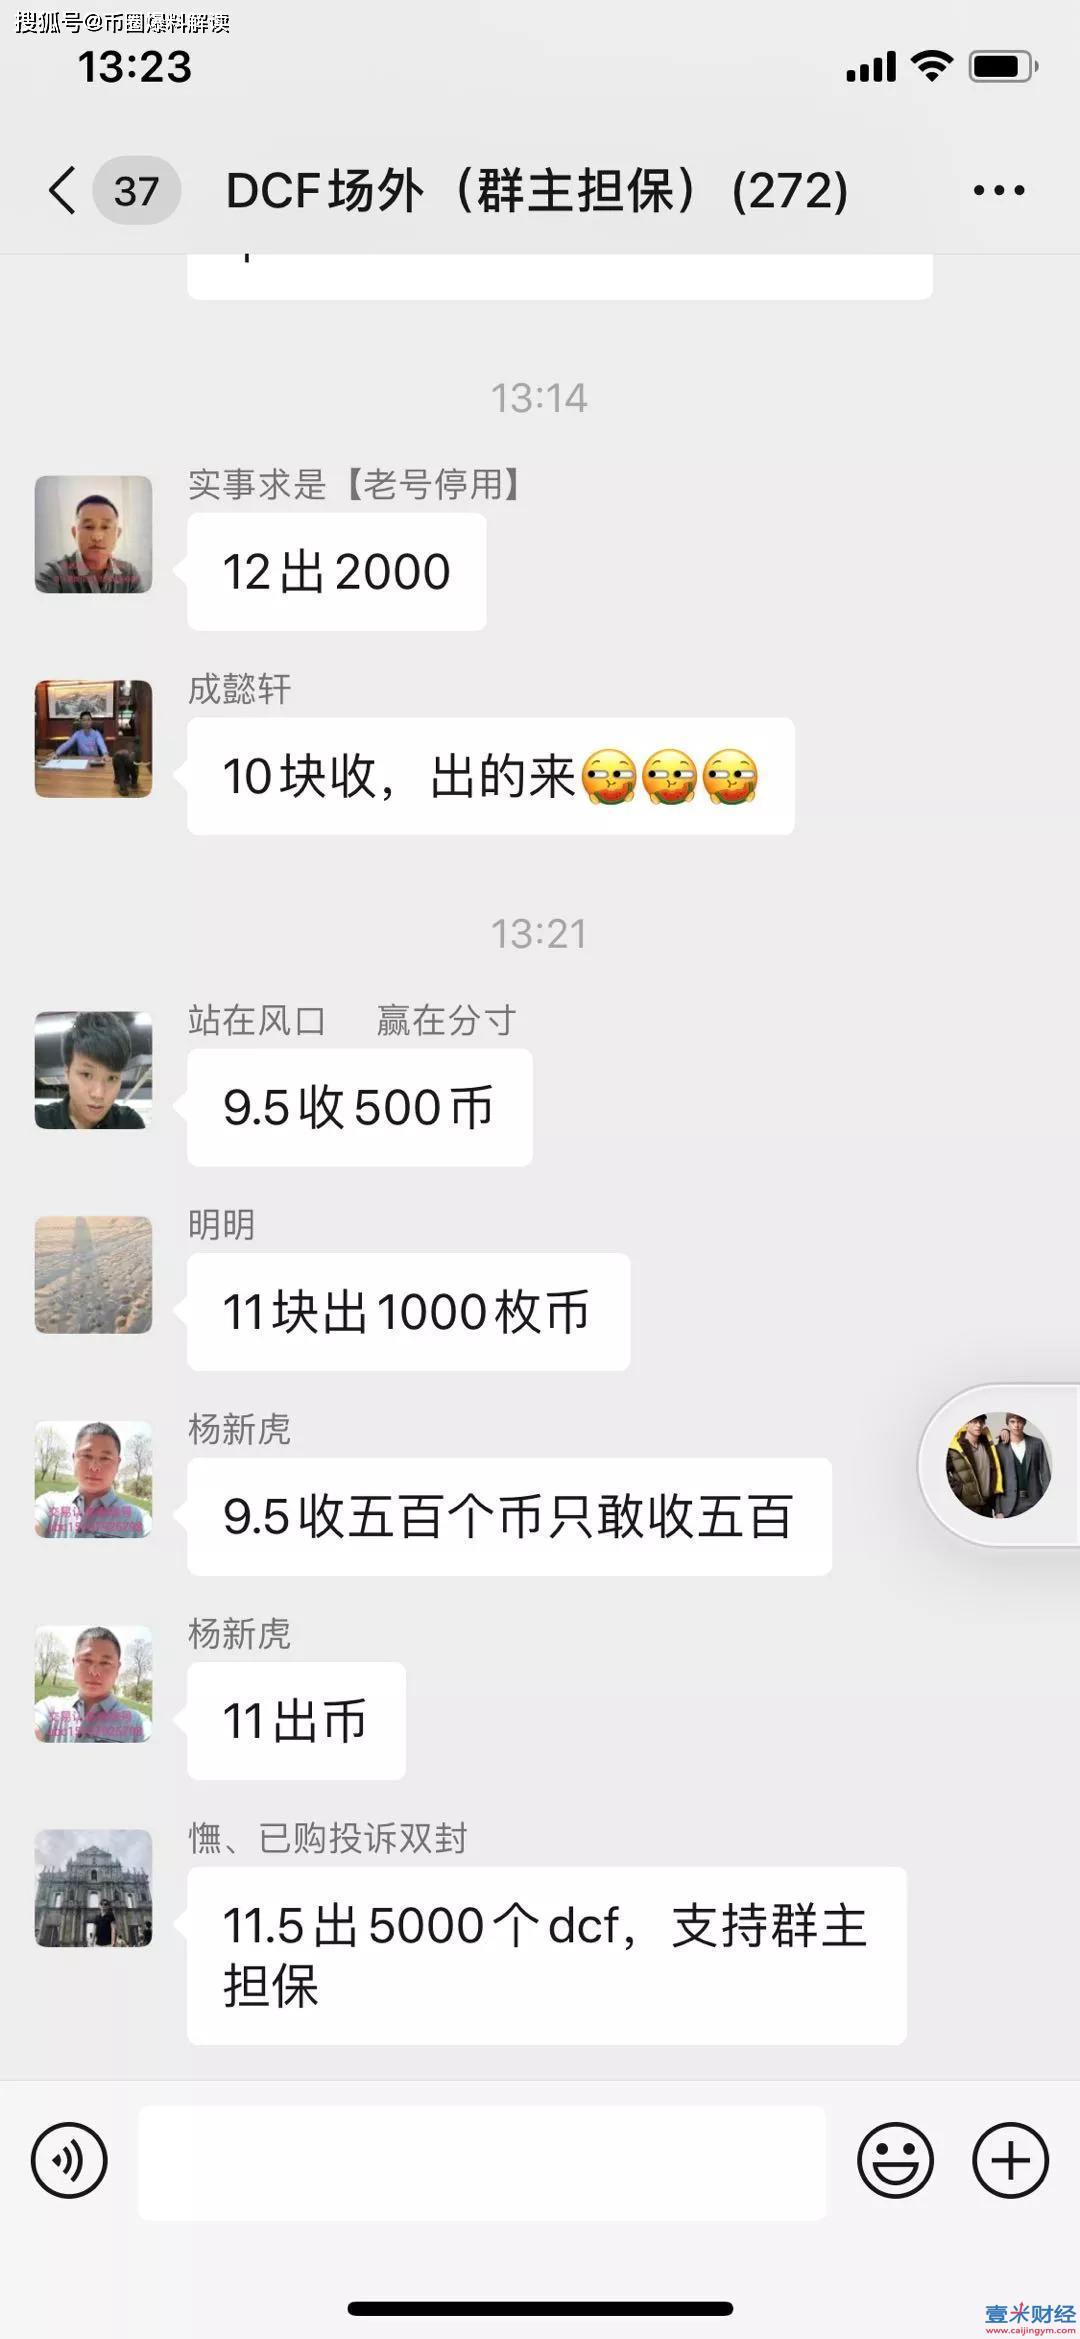 dcf张鹏和他的DCFPIUS完全就是一个诈骗集团!